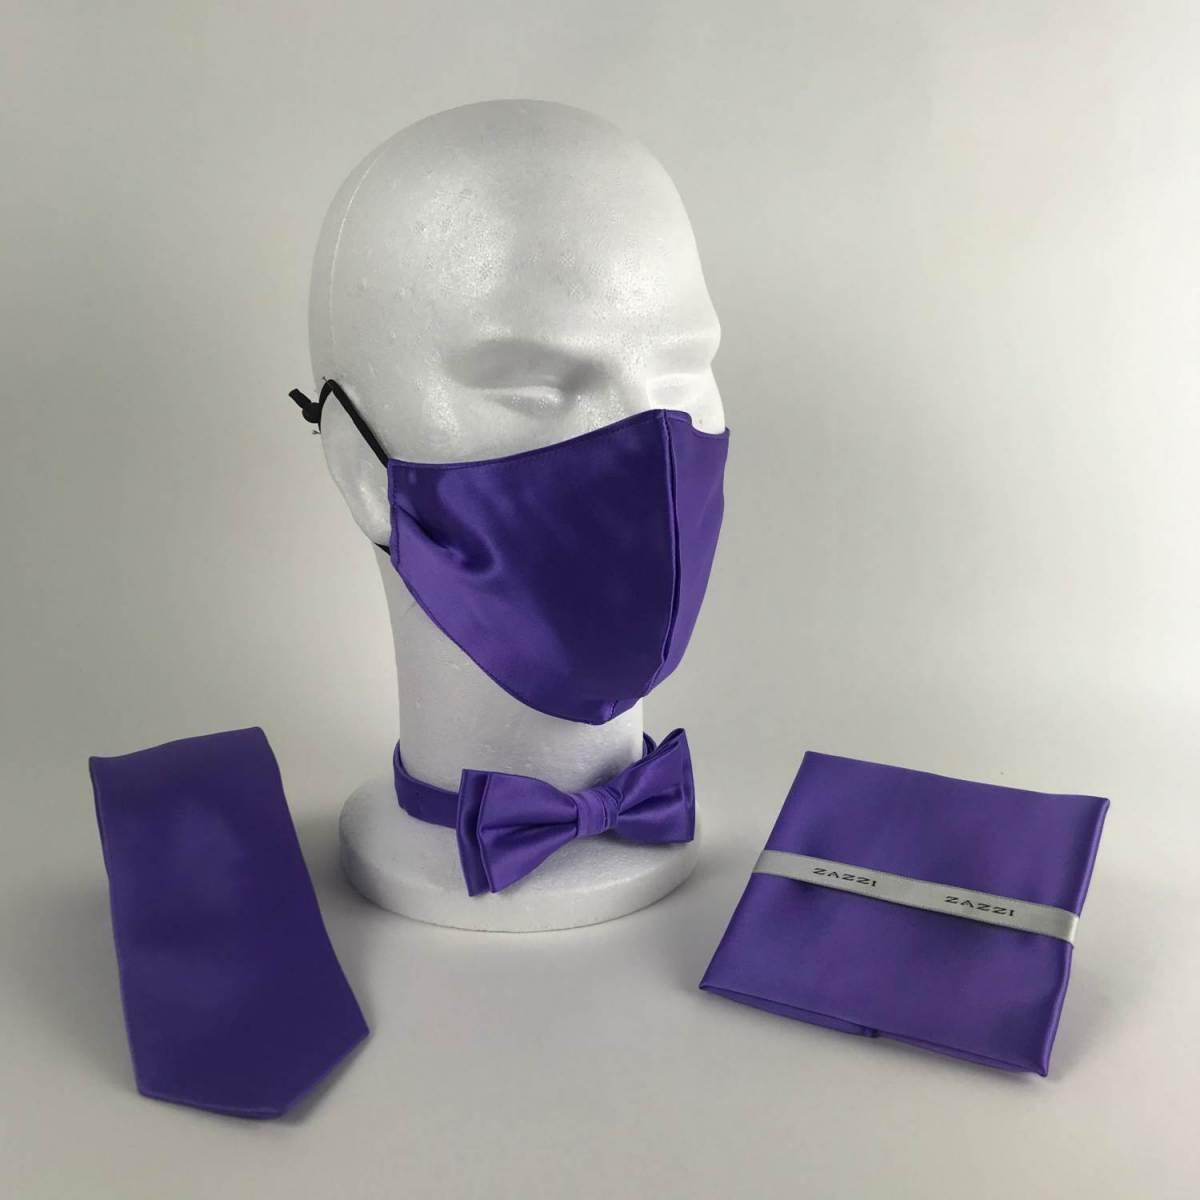 B1764 38 Cadbury Purple FM. mens ties facemasks con murphys menswear cork scaled - - Con Murphys Menswear